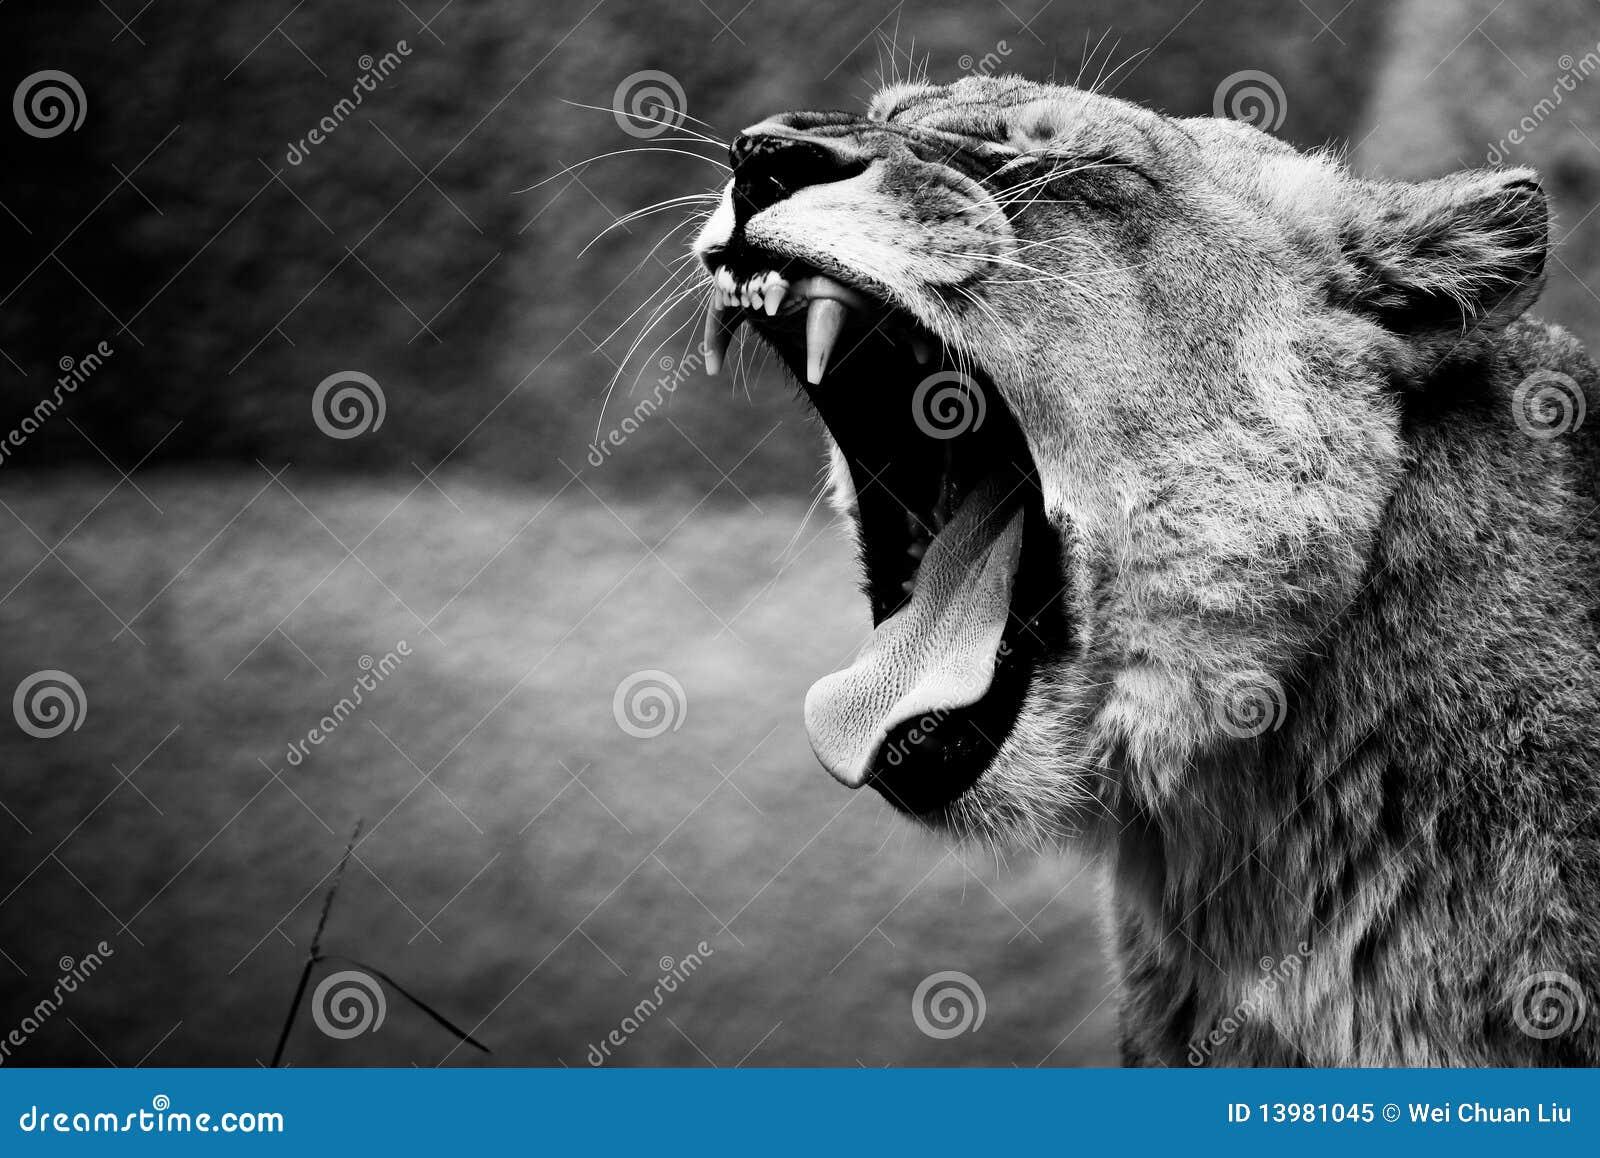 Lion roar stock image  Image of eyes, african, leader - 13981045